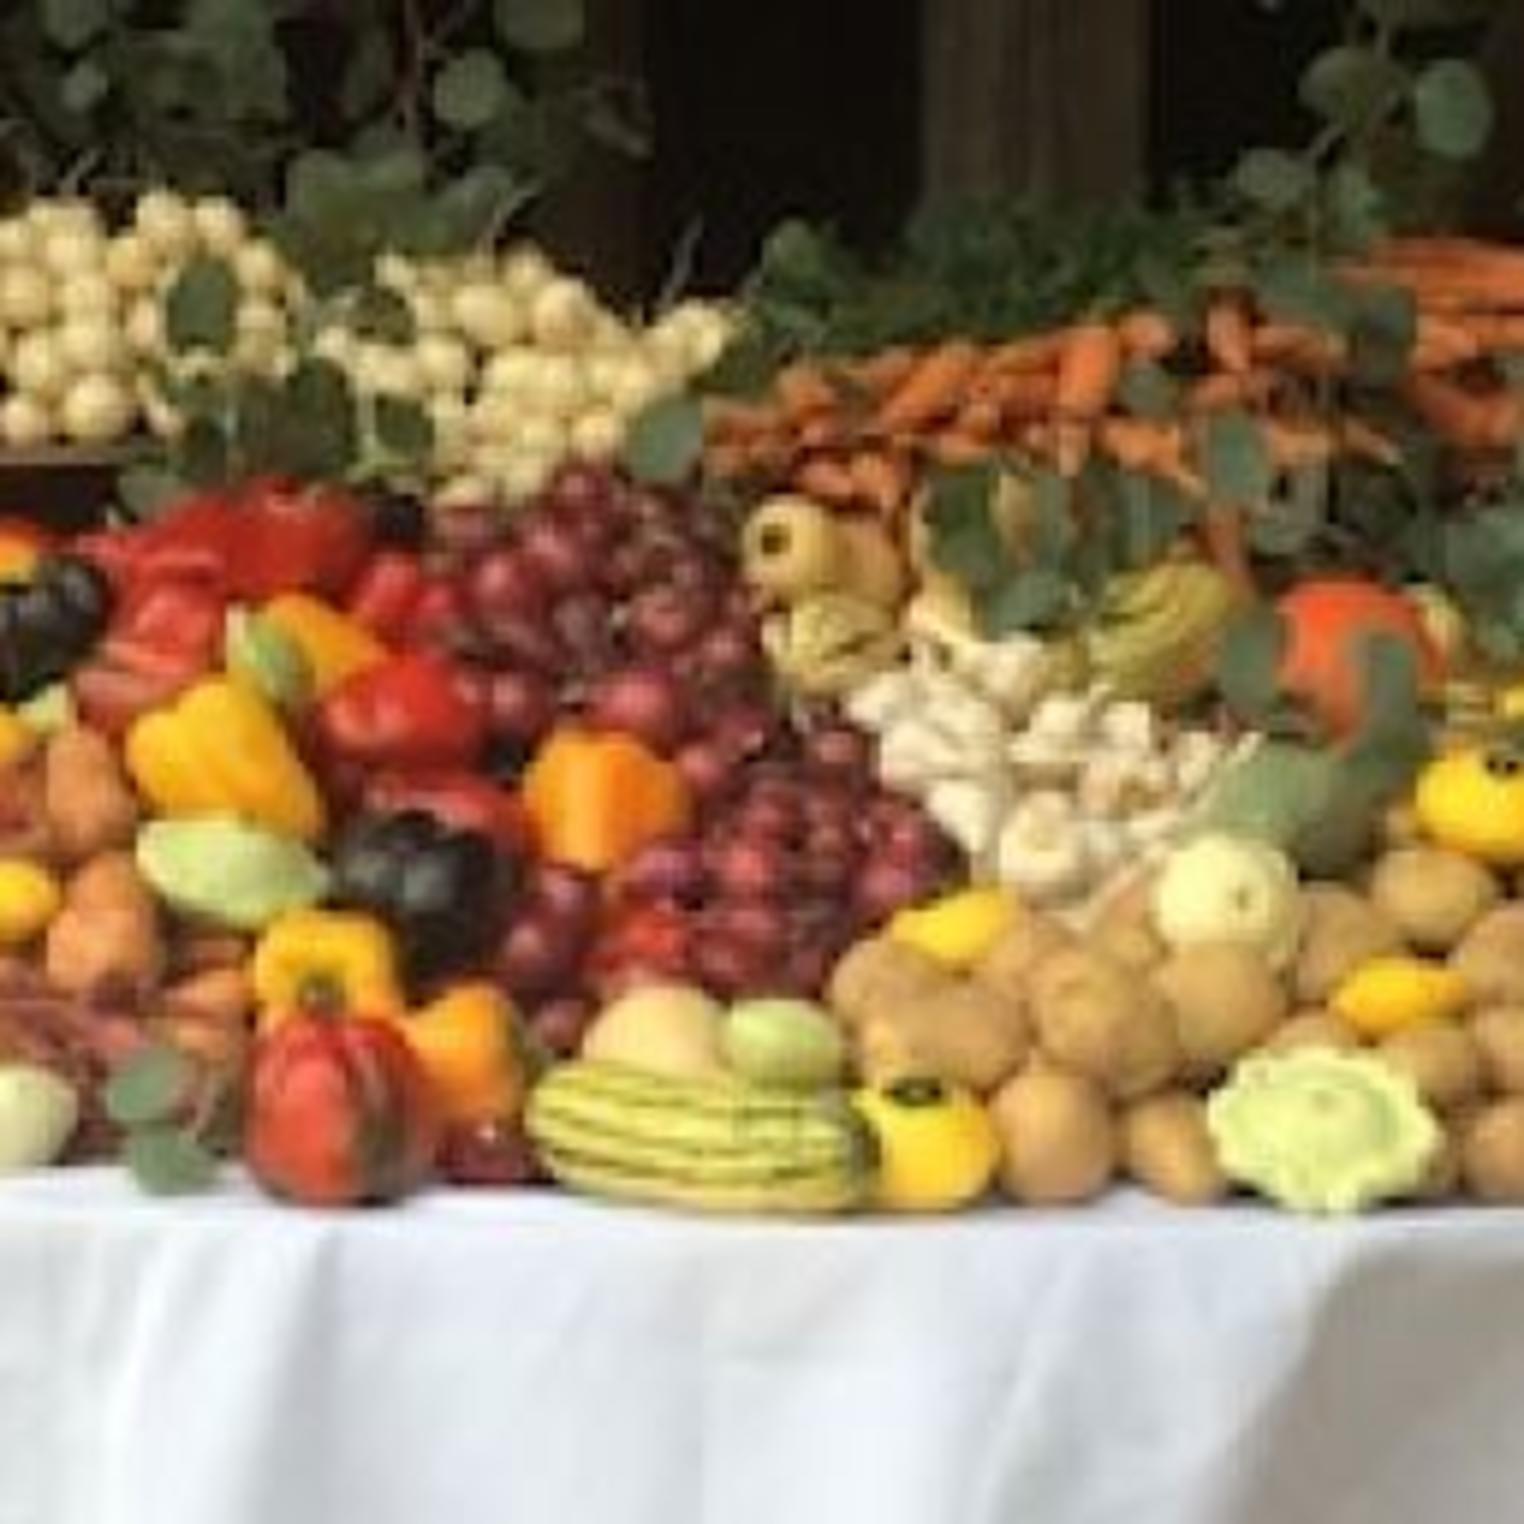 Cornucopia of Produce from Everblossom Farm